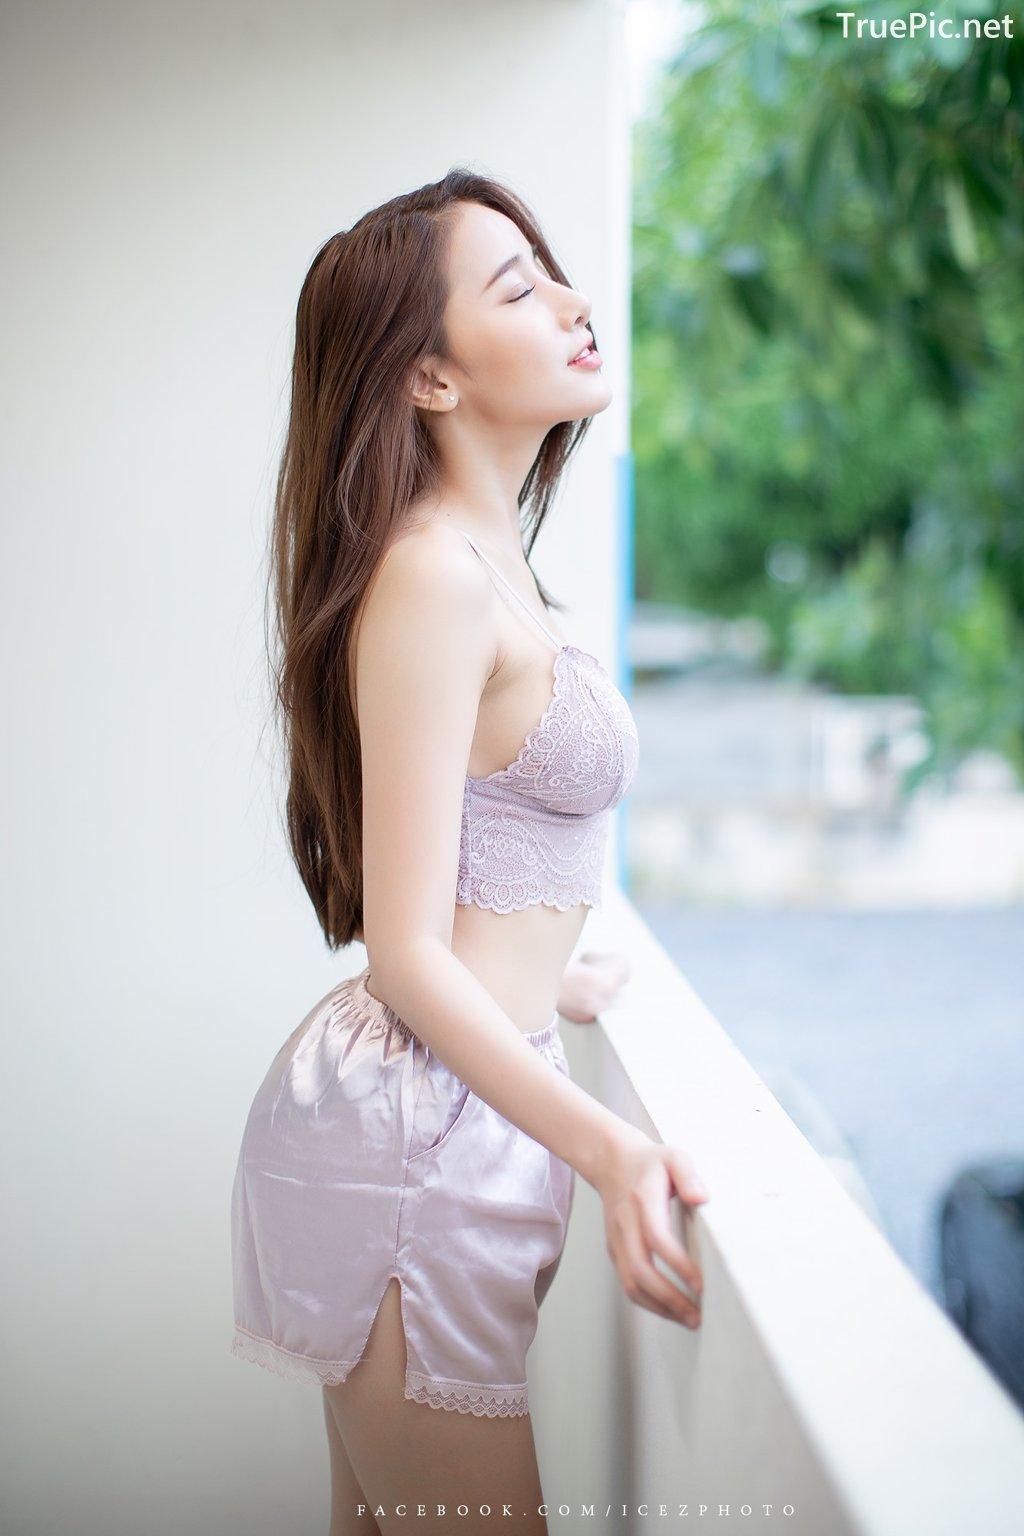 Image-Thailand-Hot-Model-Pichana-Yoosuk-Sexy-Purple-Bra-Shiny-Short-Pants-TruePic.net- Picture-9